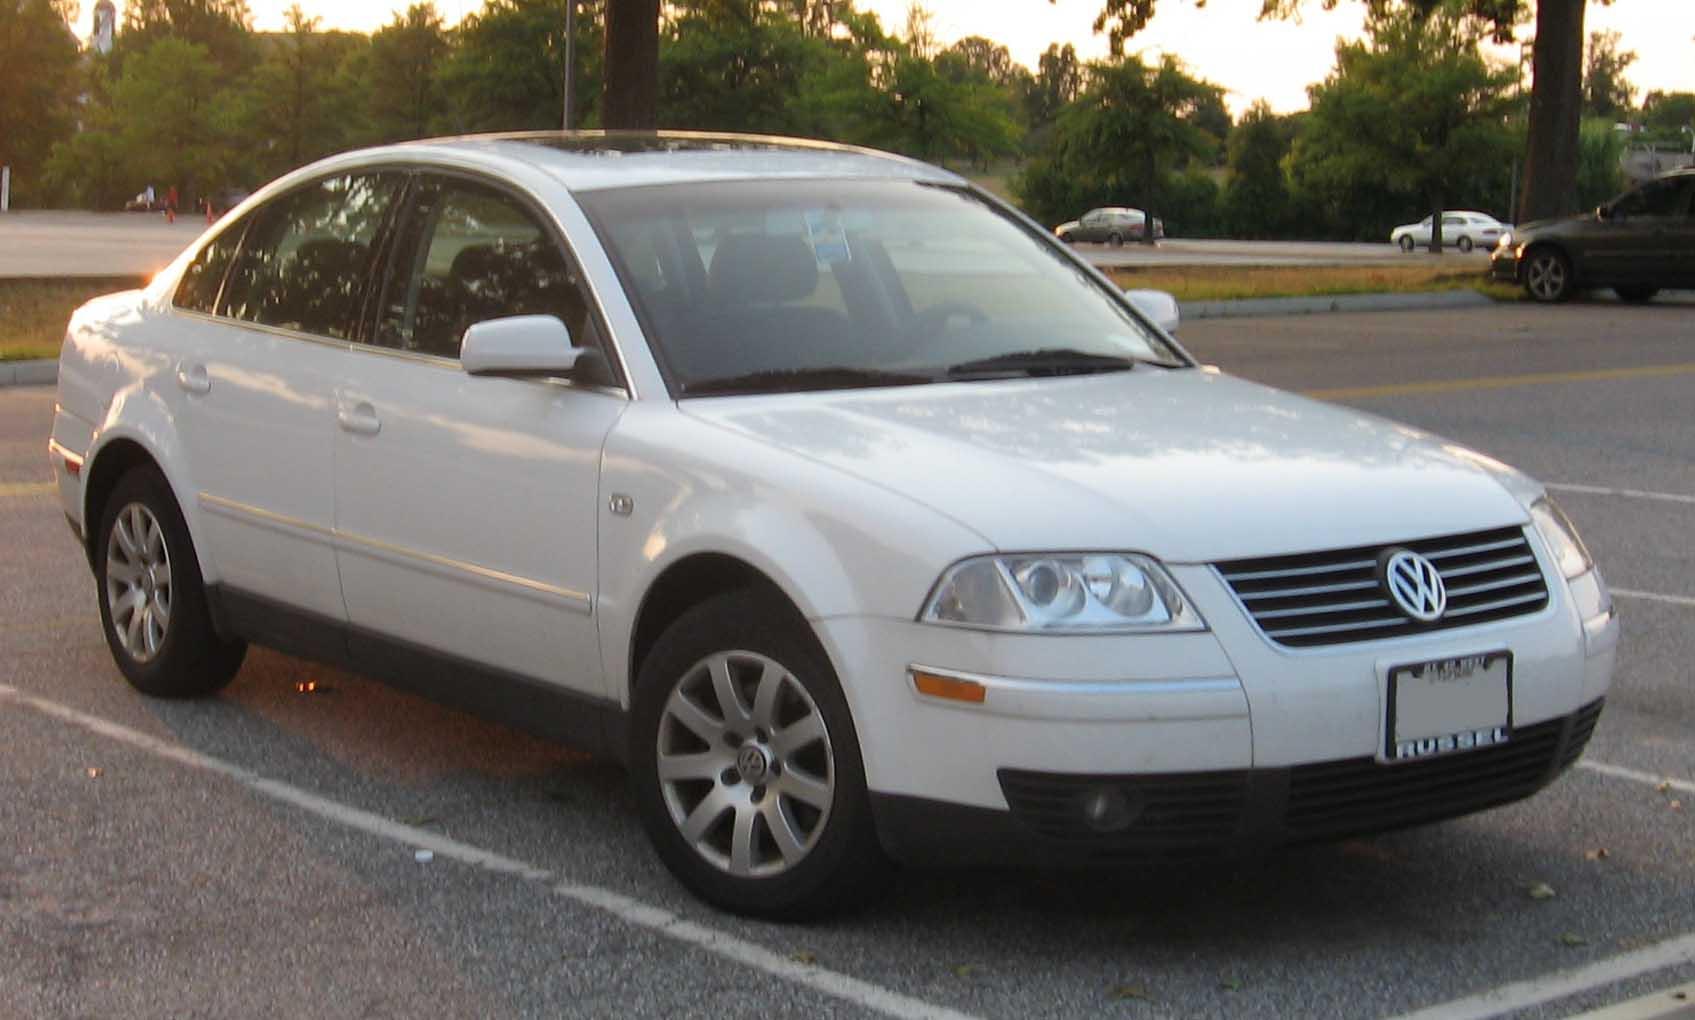 All Types passat 2000 : File:Volkswagen-Passat-B5.5.jpg - Wikimedia Commons